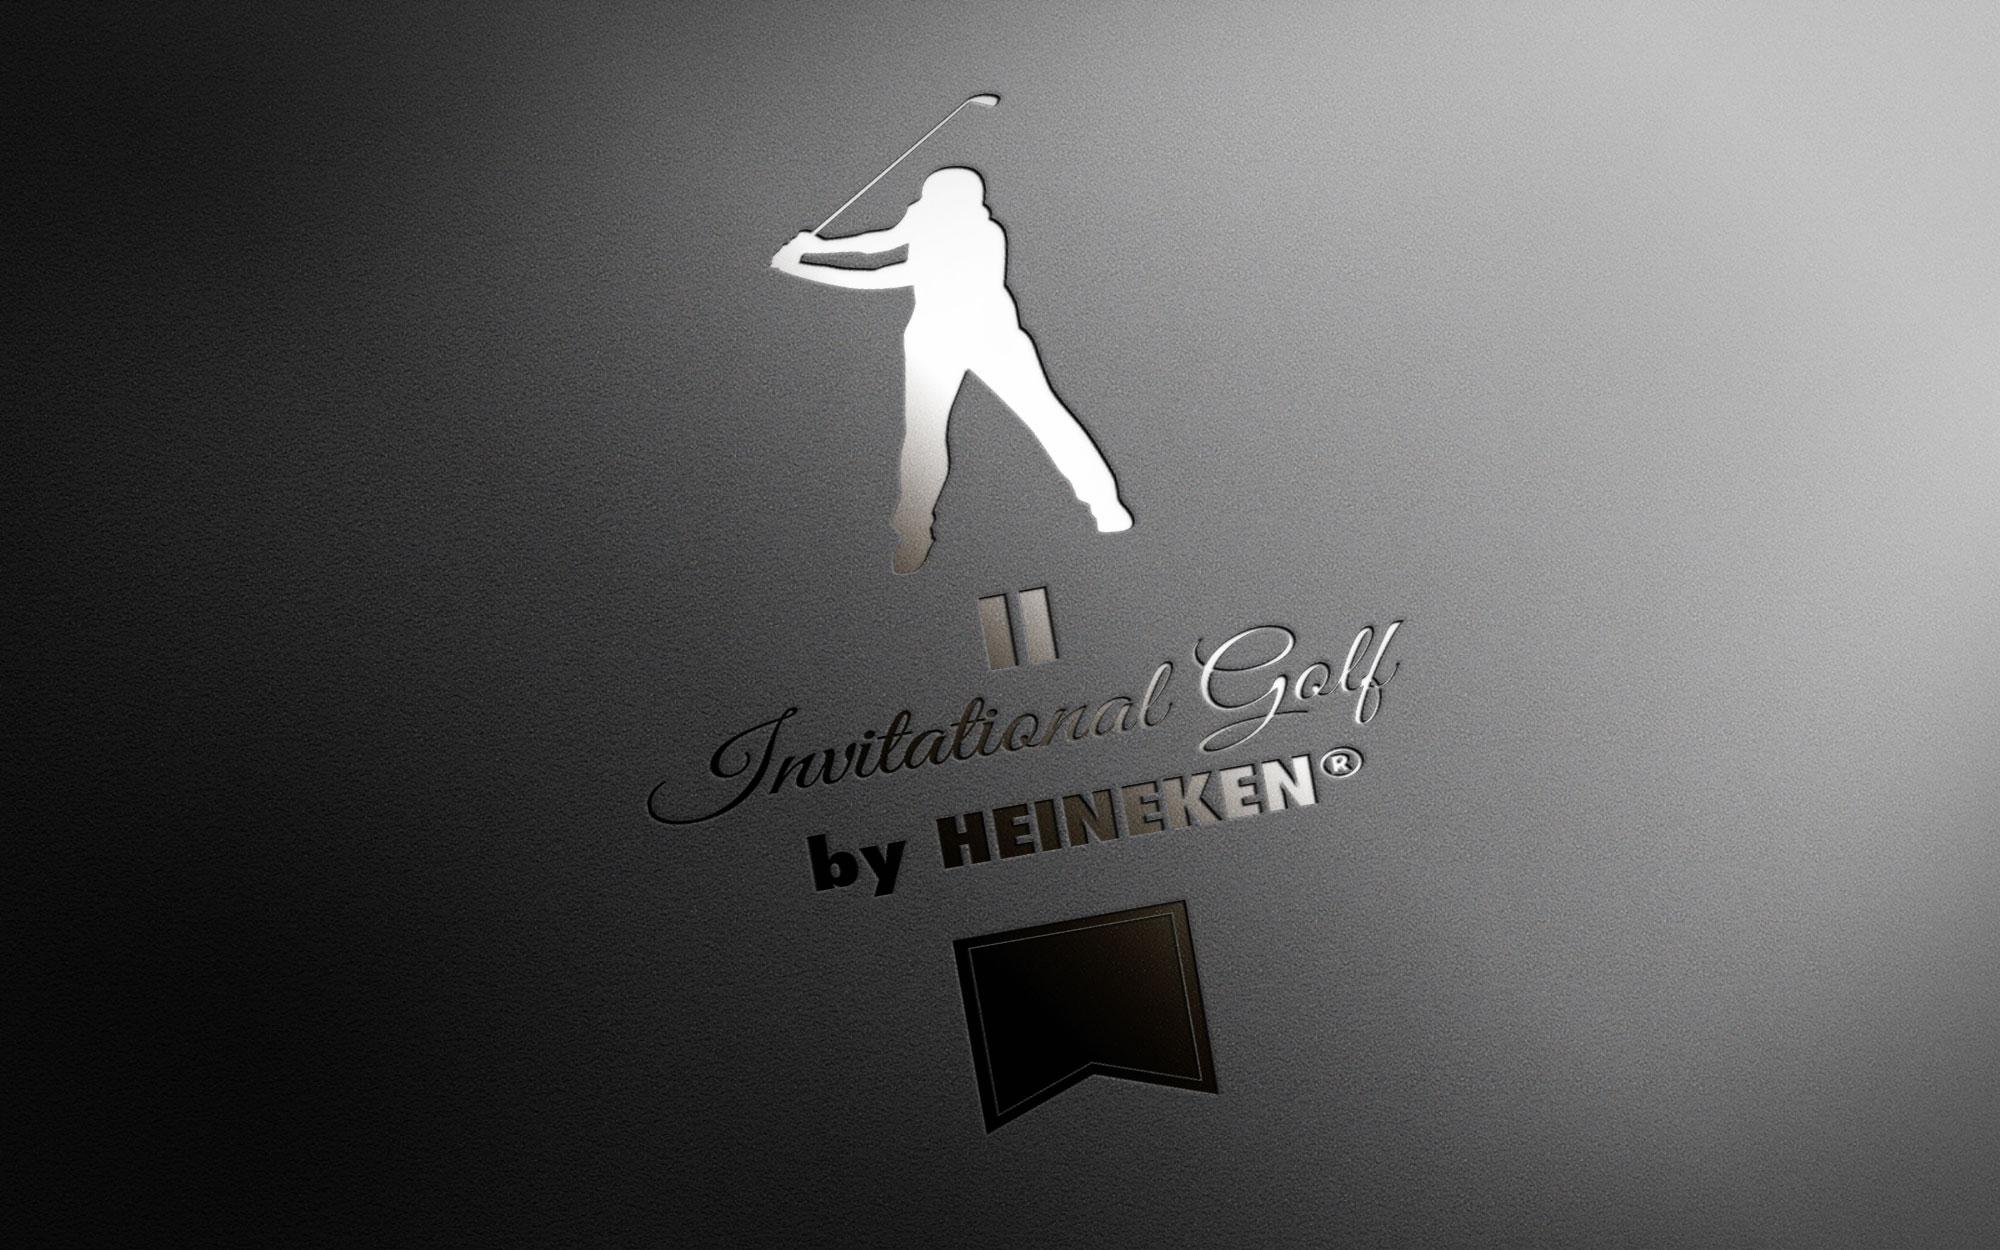 THE-OFFICE_golf14.jpg